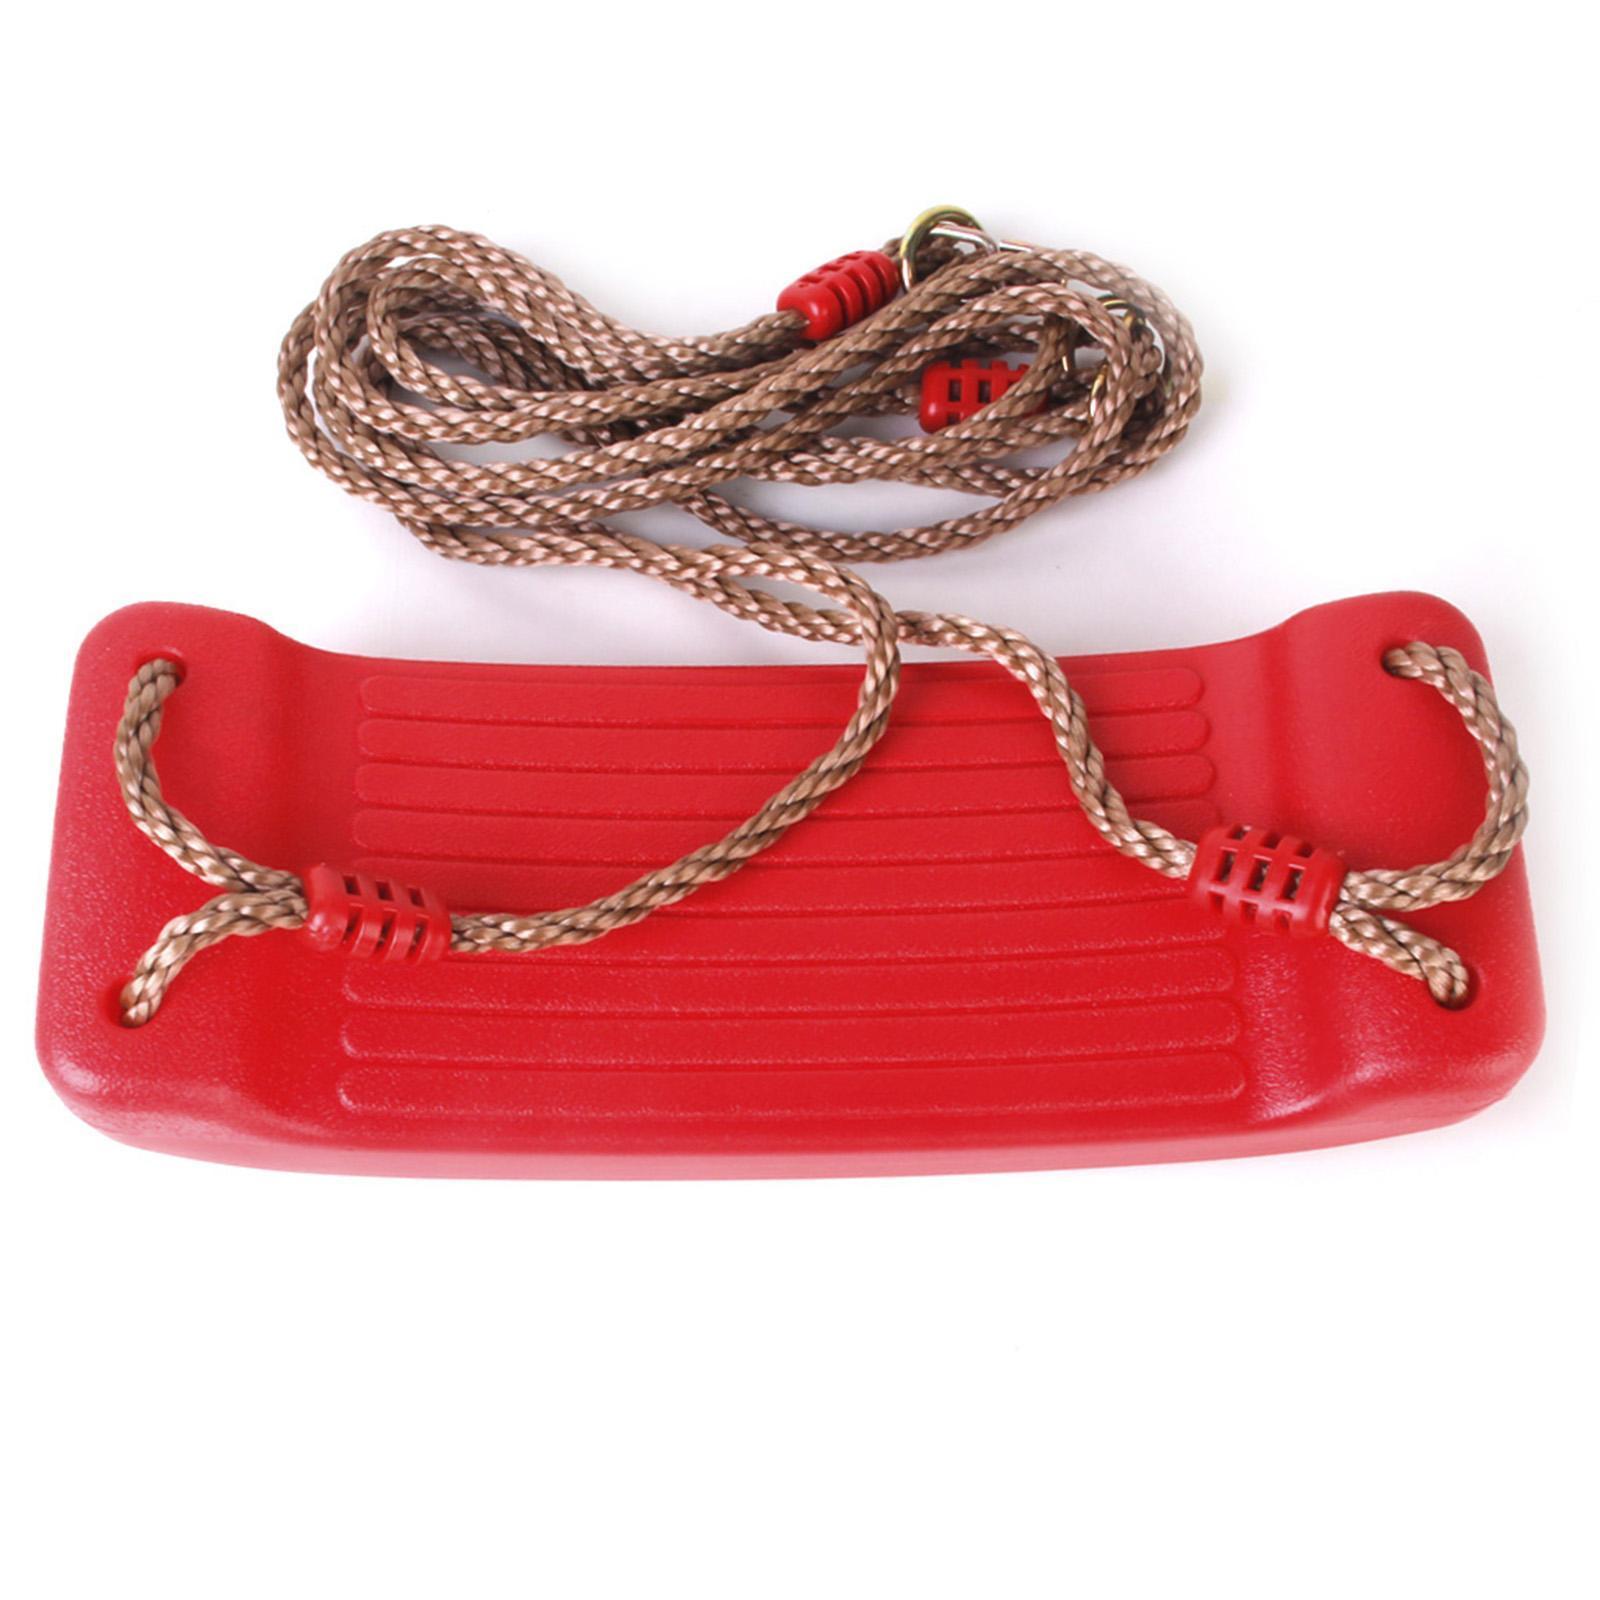 Garden-Swing-Set-Seat-Rope-Hanging-Strap-Connector-Metal-Chain-Kid-Adult-Outdoor miniatuur 9